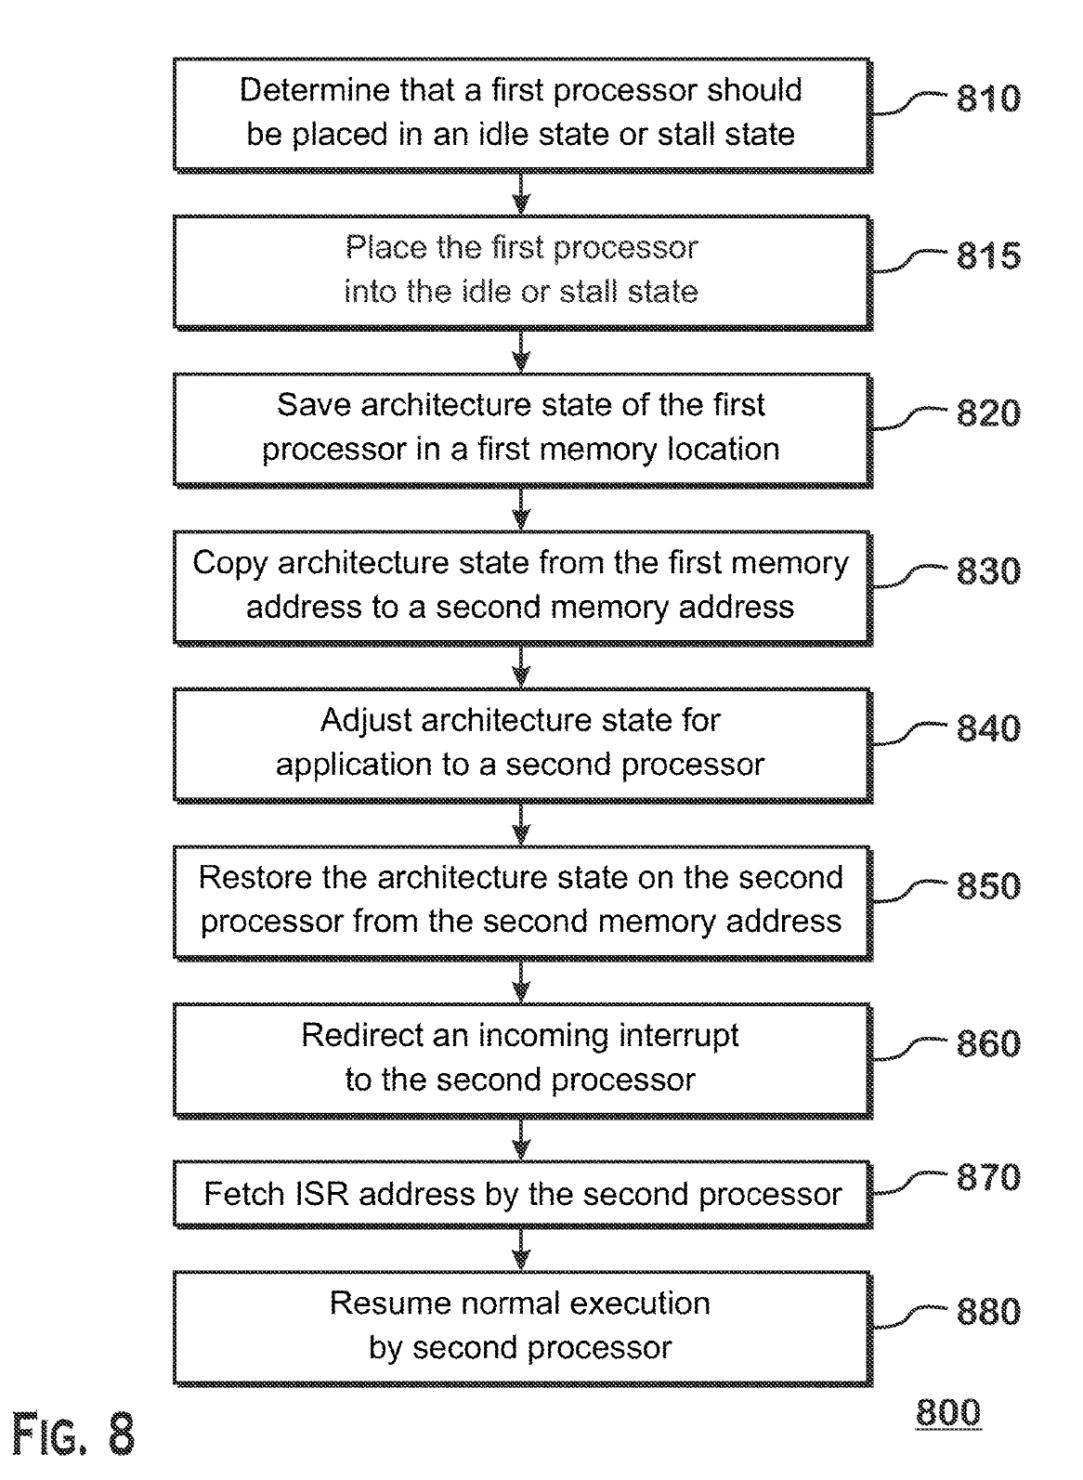 amd-next-gen-ryzen-cpu-apu-hybrid-architecture-with-big-and-little-processor-cores-_6